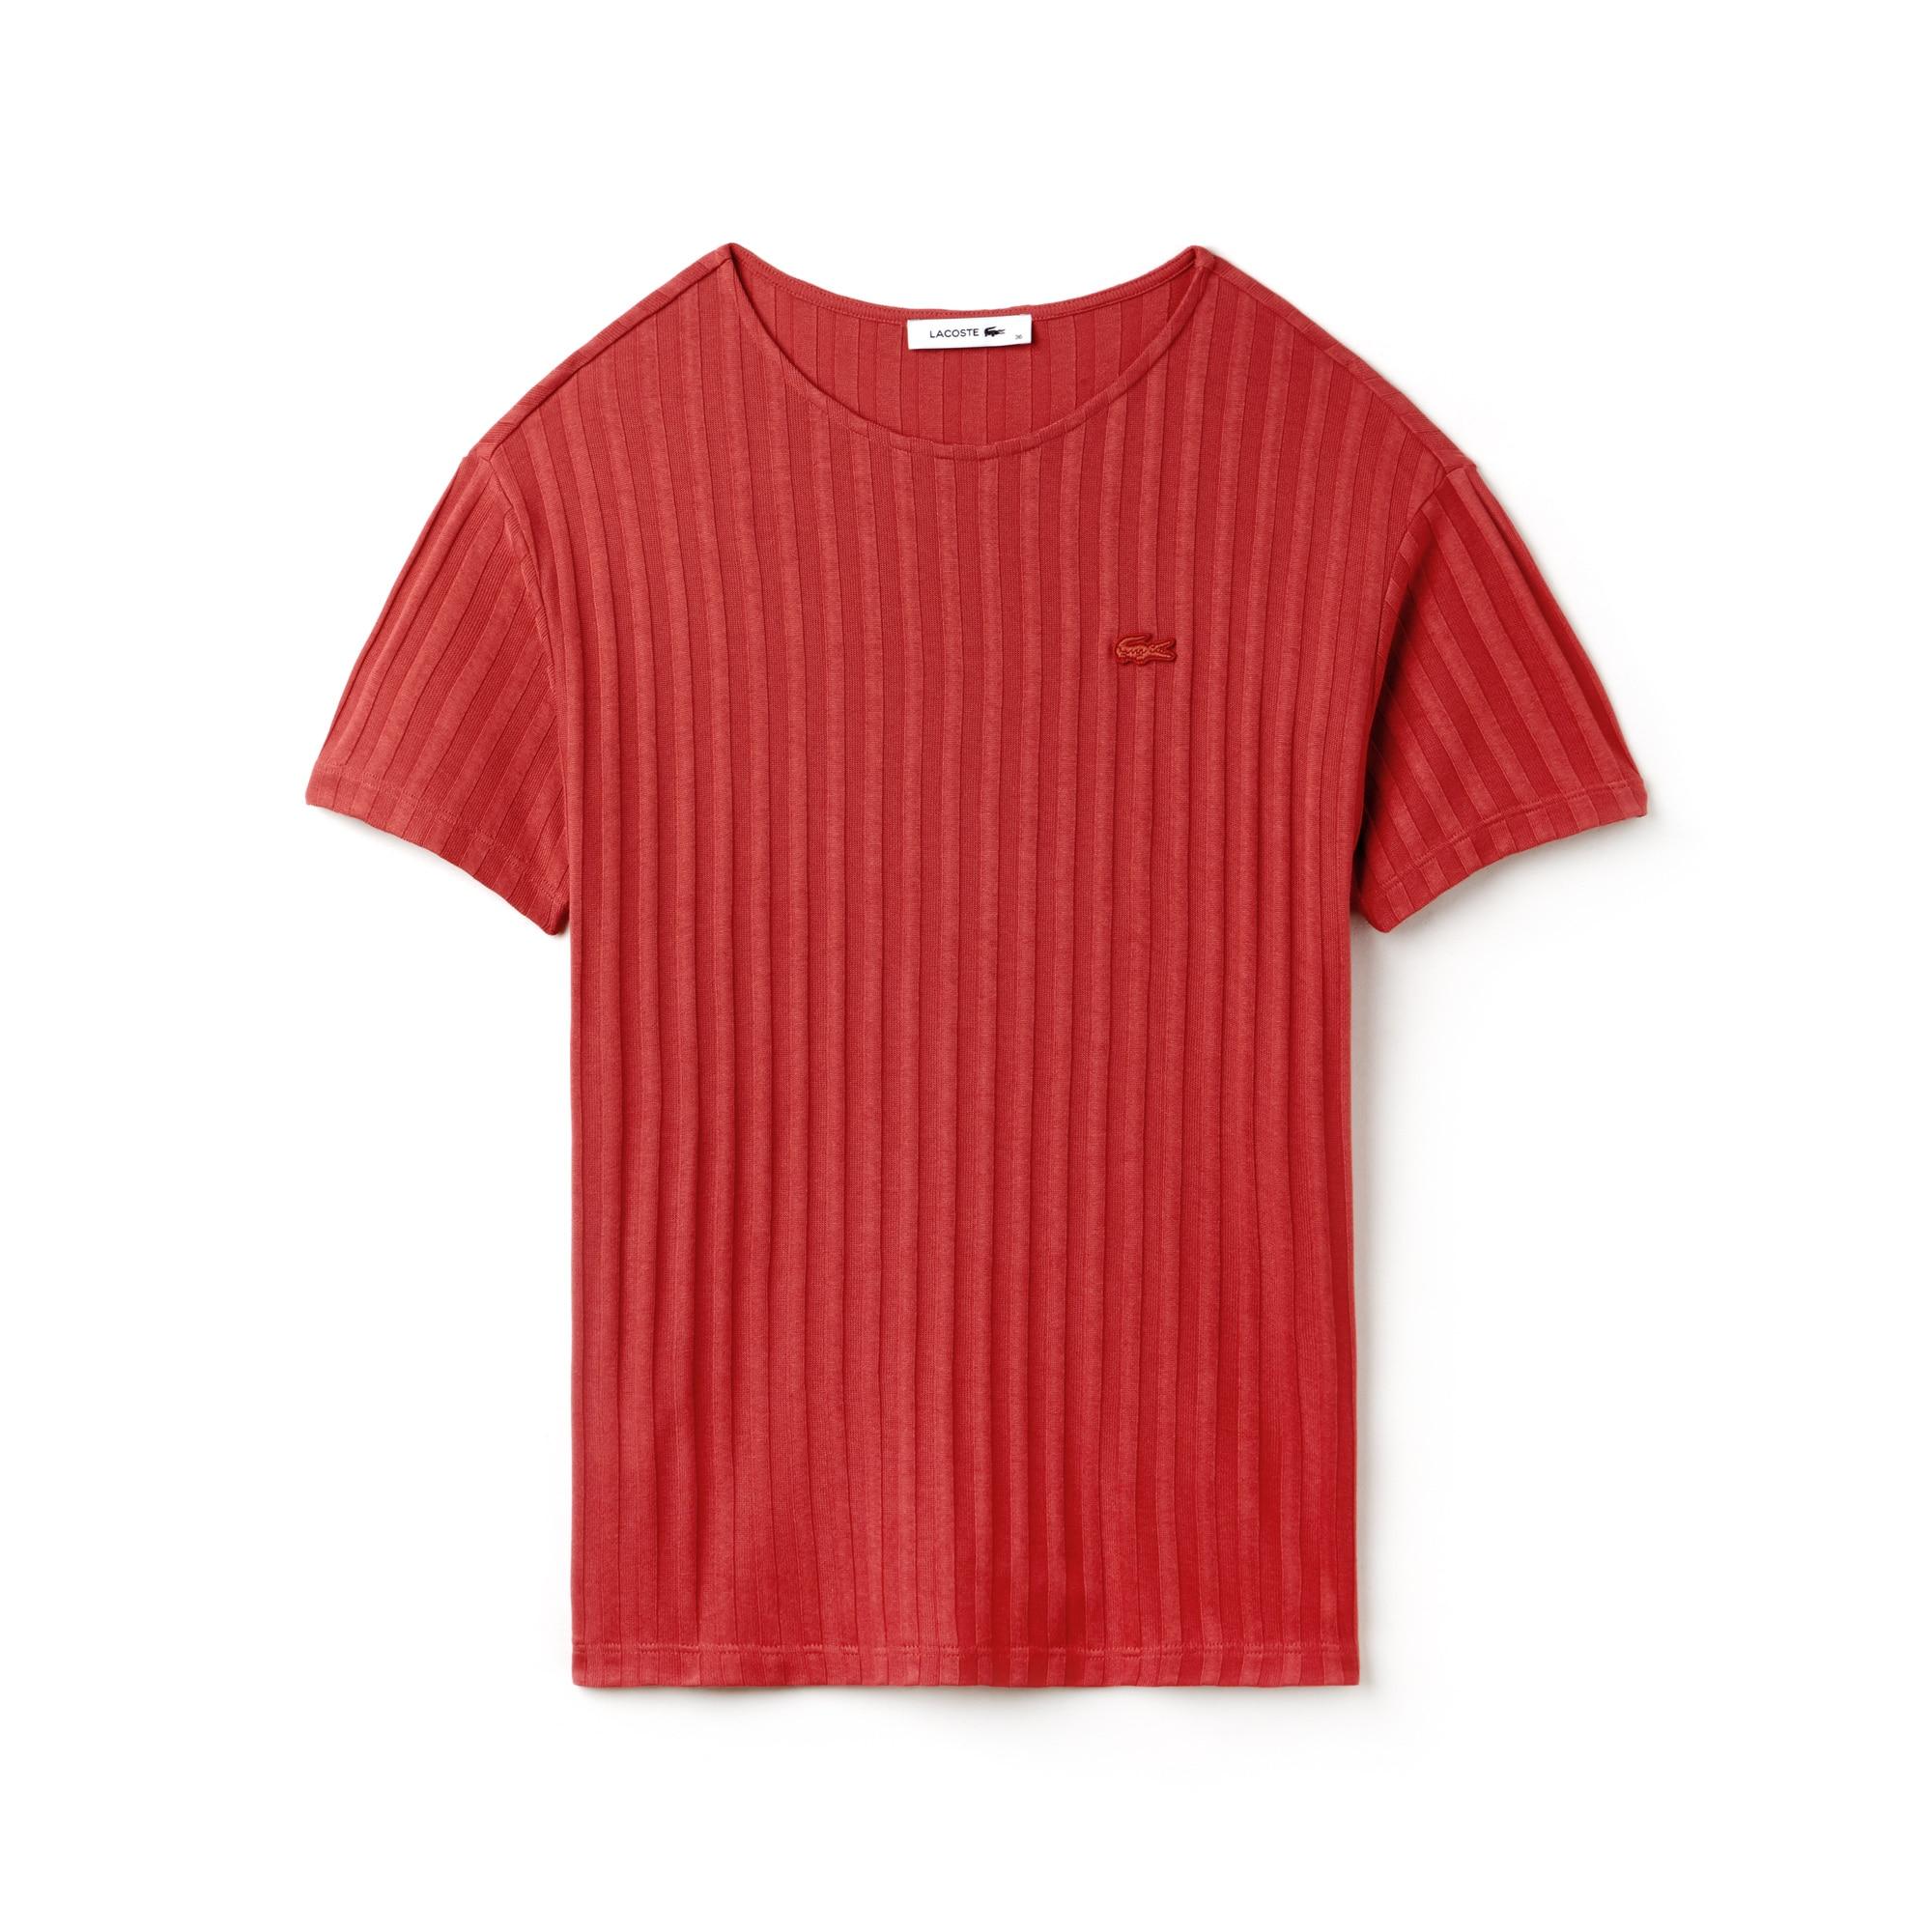 Women's Wide Neck Rayon T-shirt